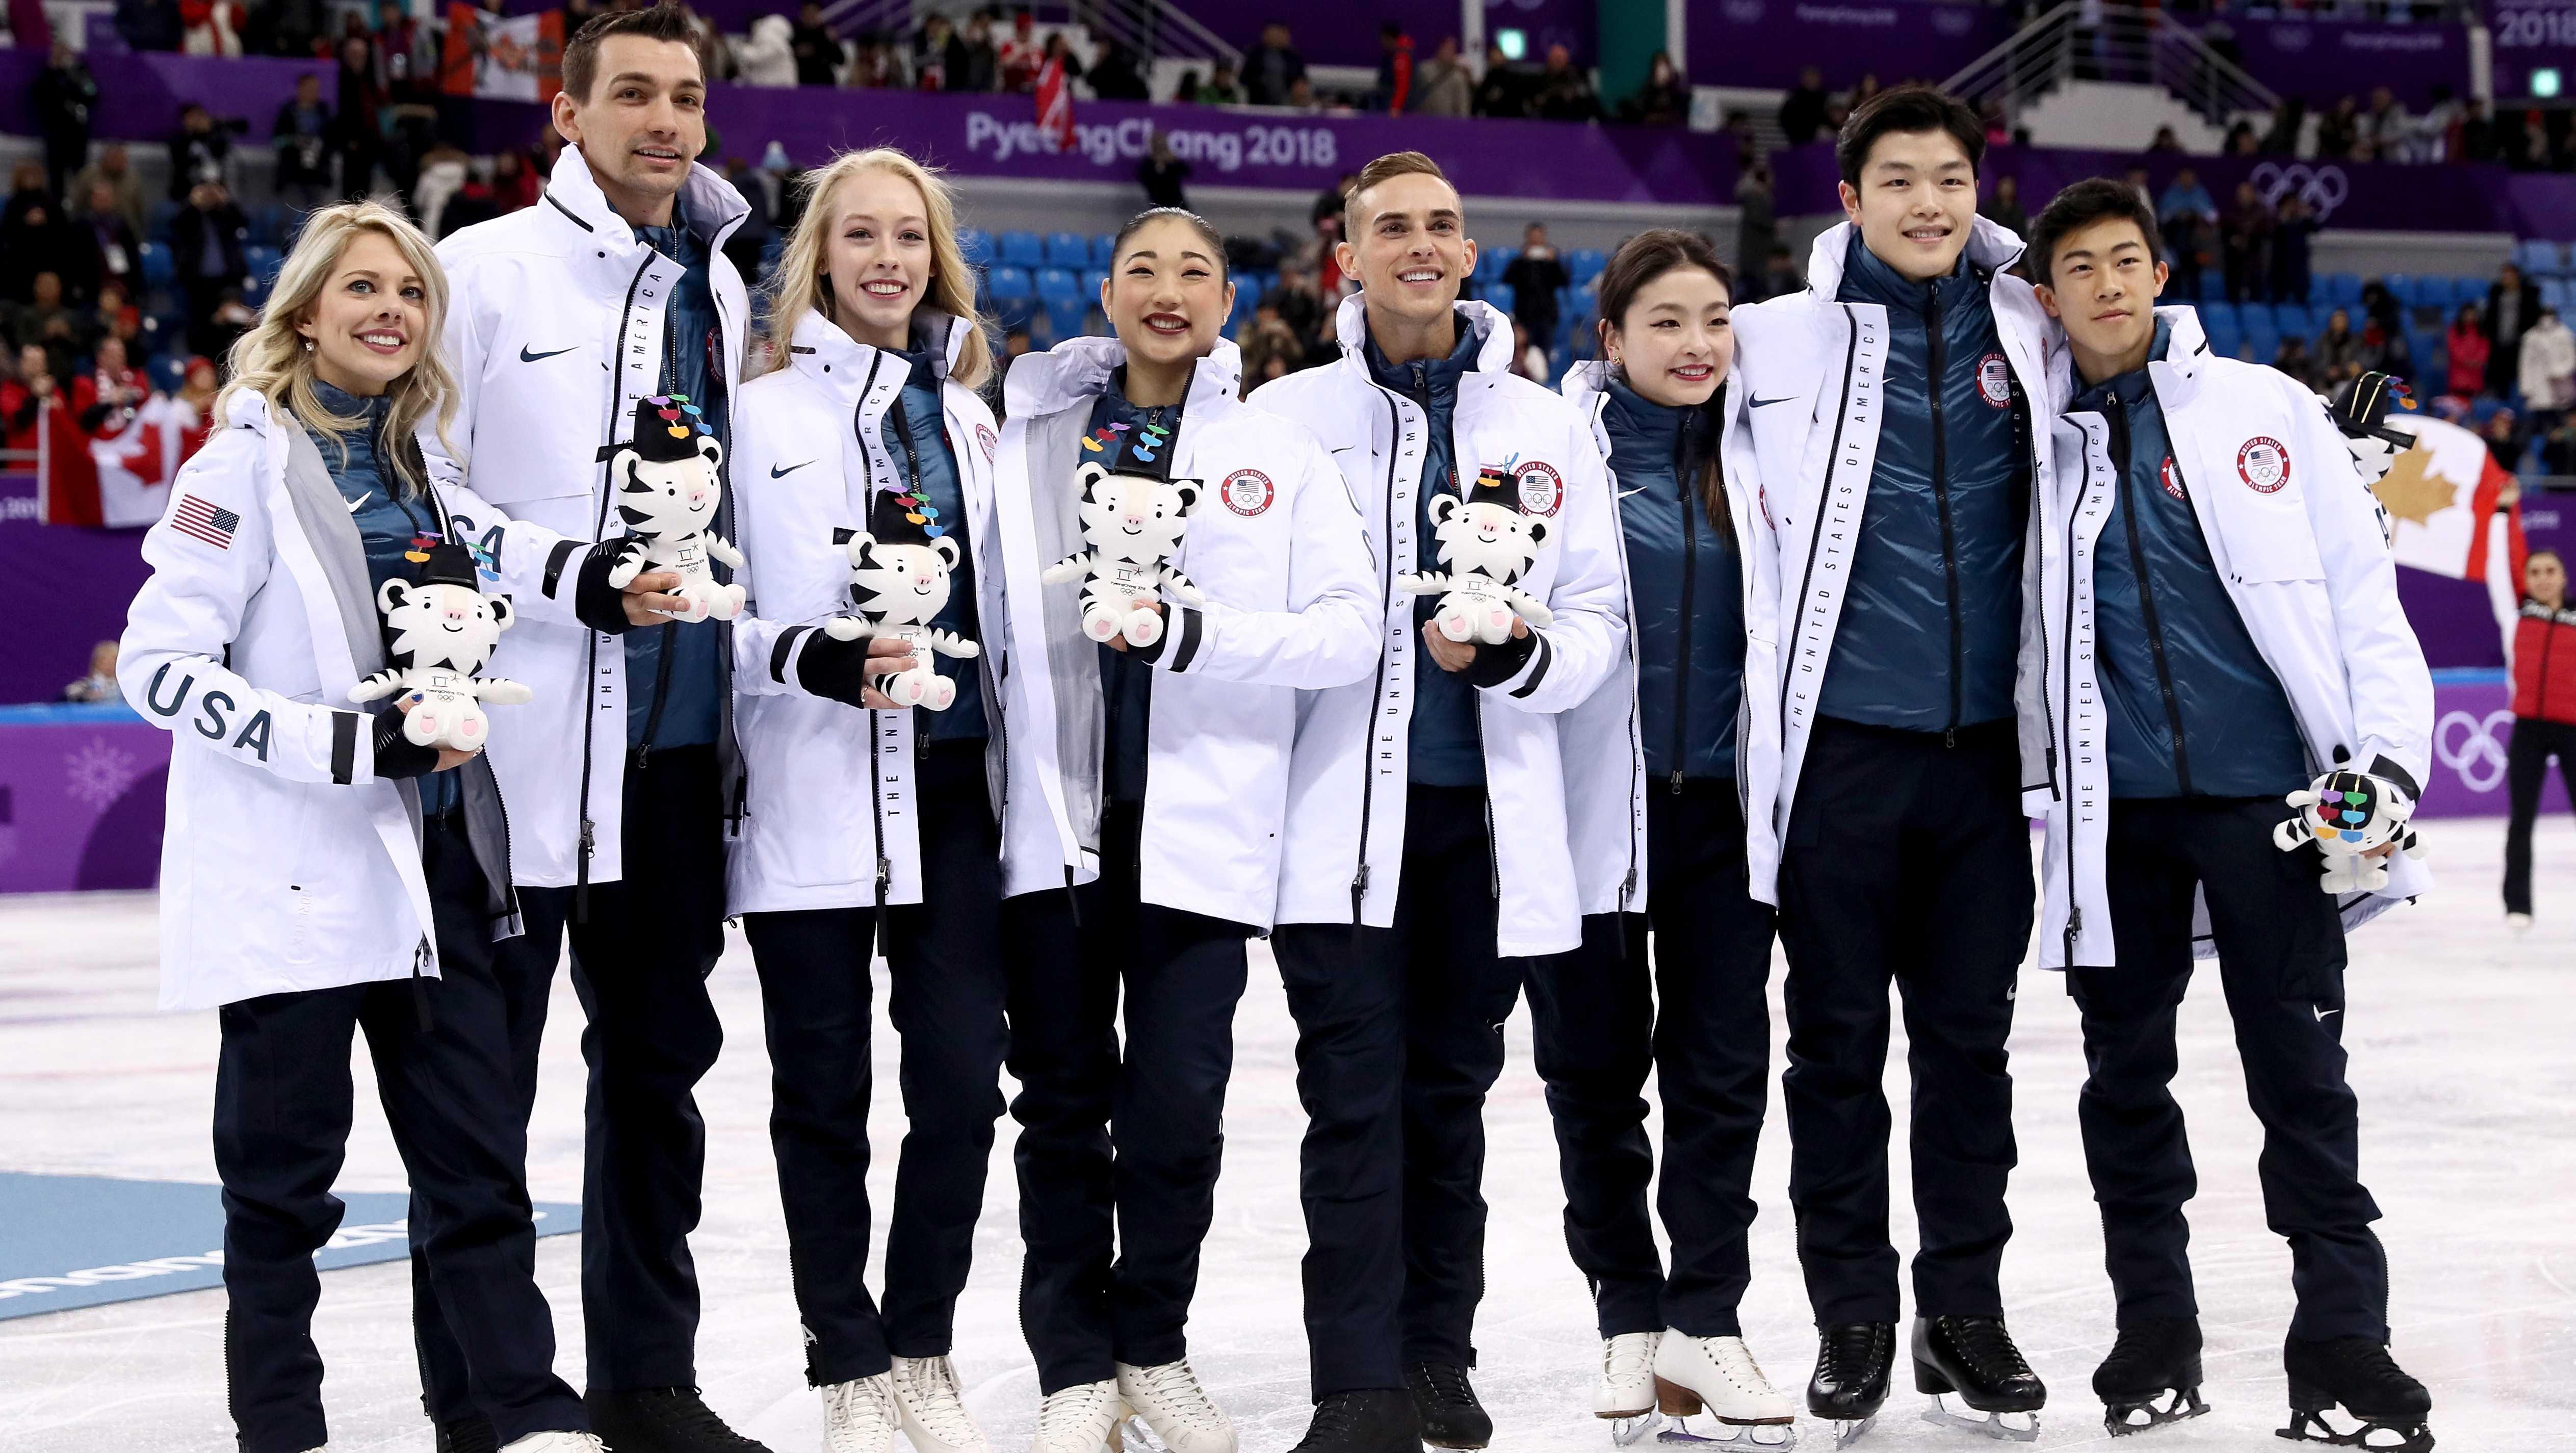 2018 winter olympics usa team figure skating